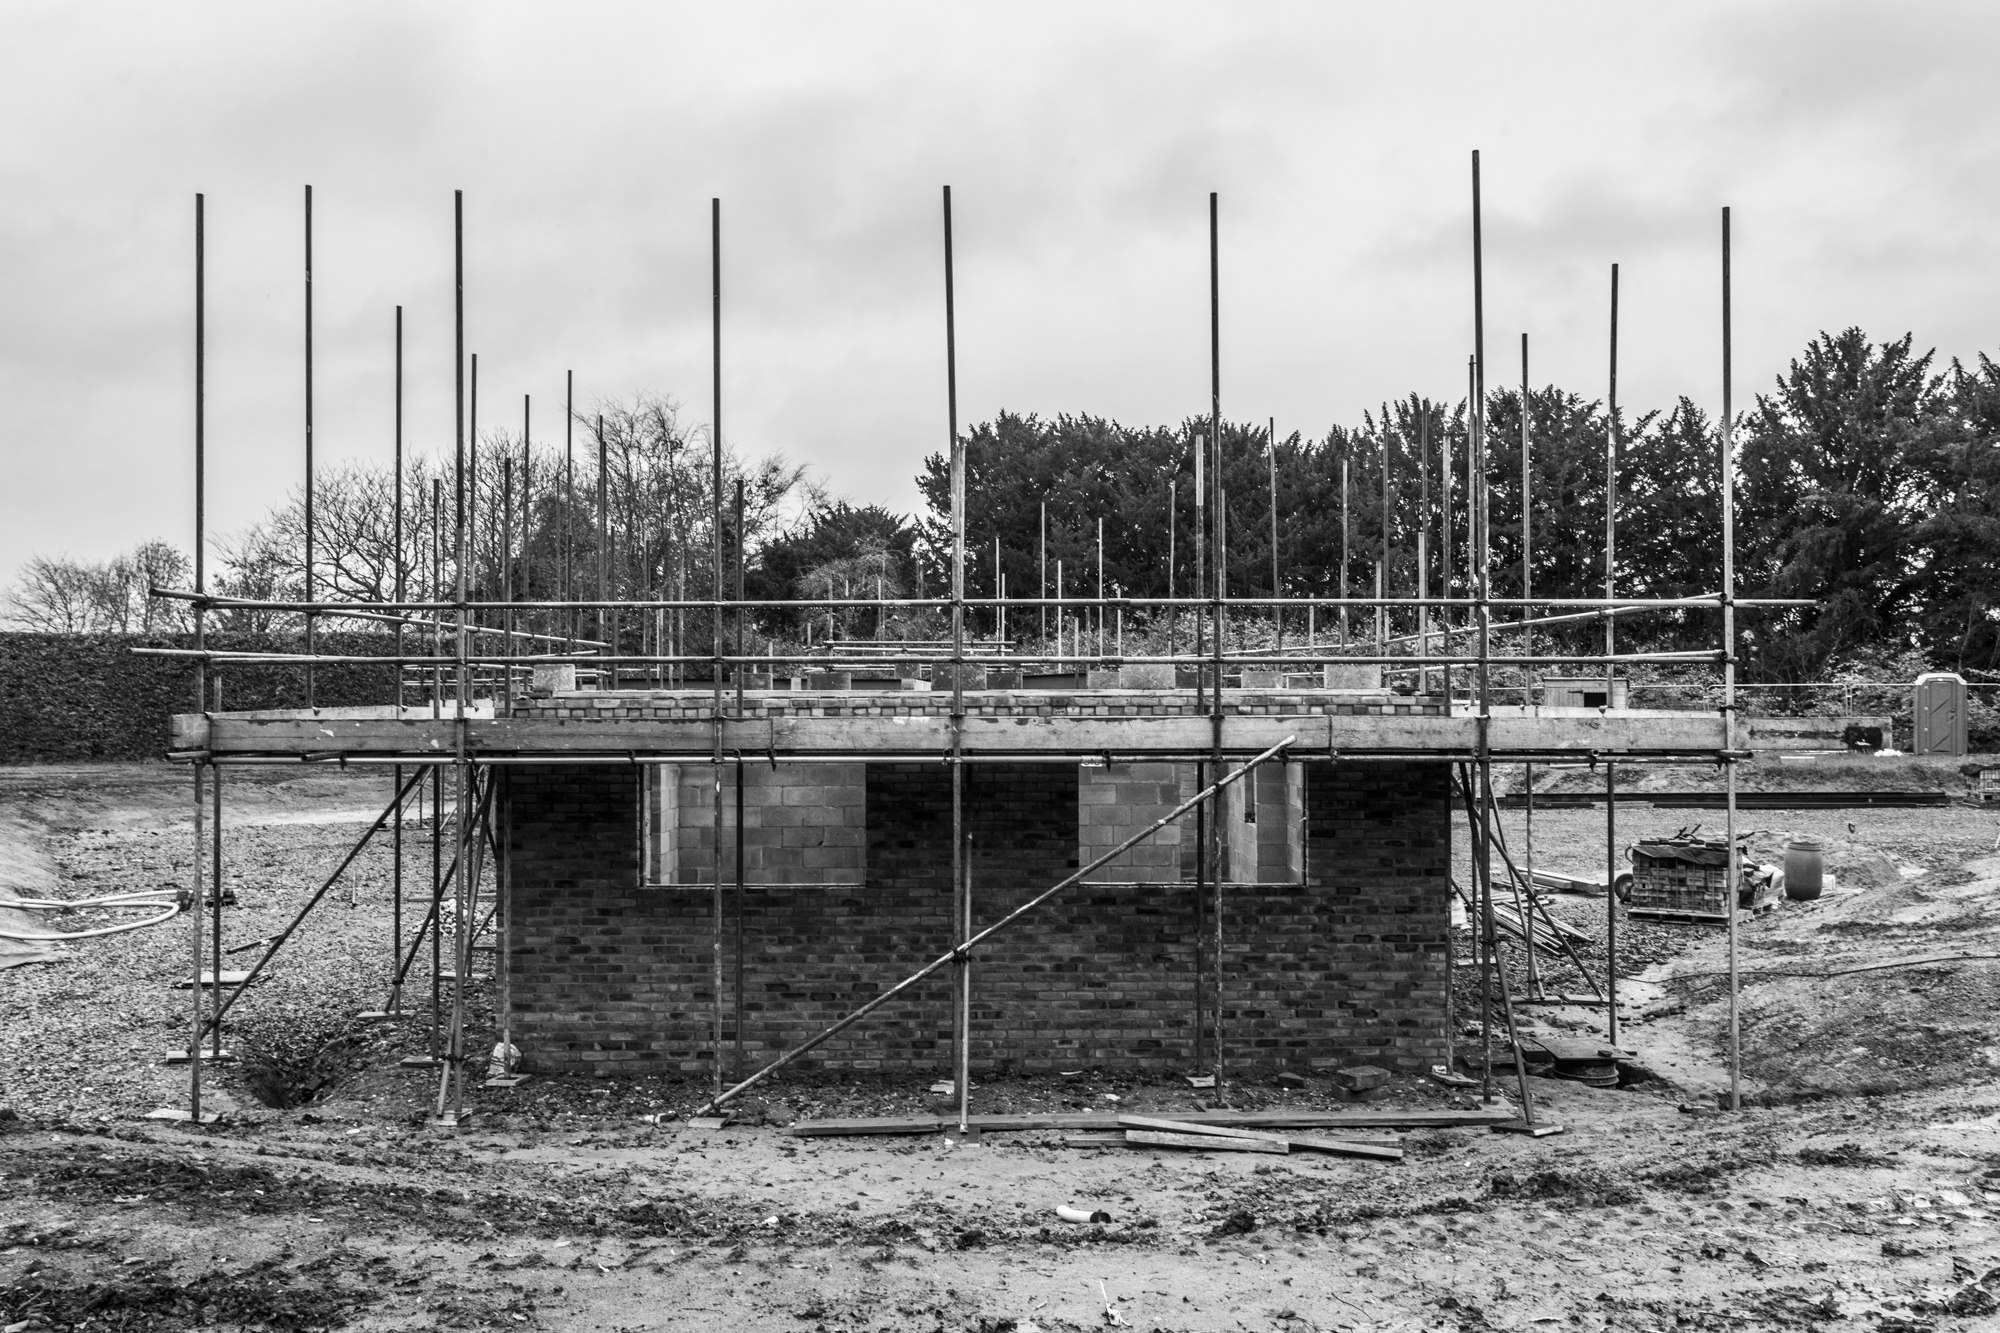 FlinthurstHouse_Construction_08.jpg